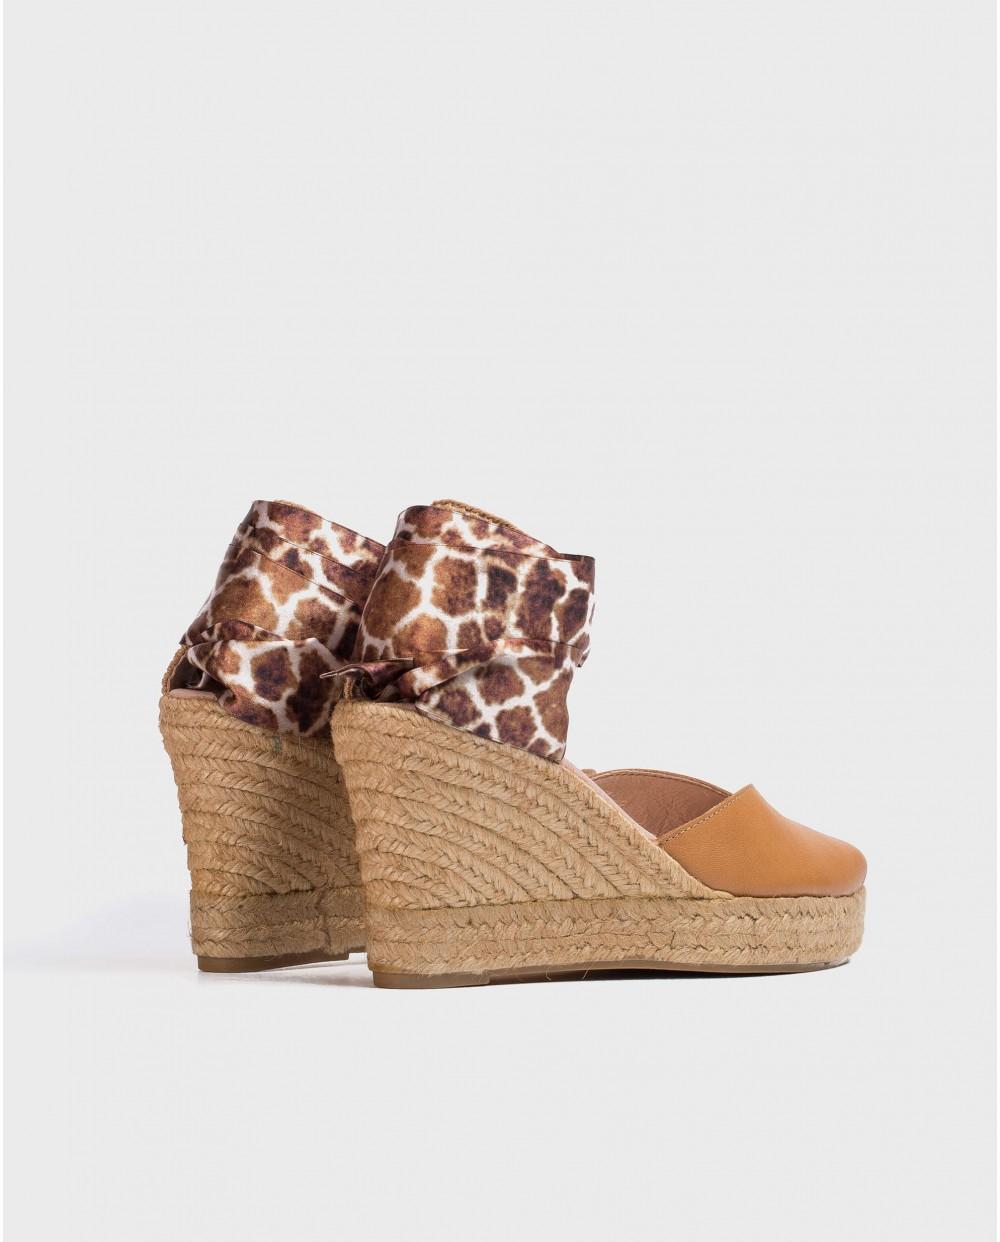 Wonders-Wedges-Jute sandal with straps